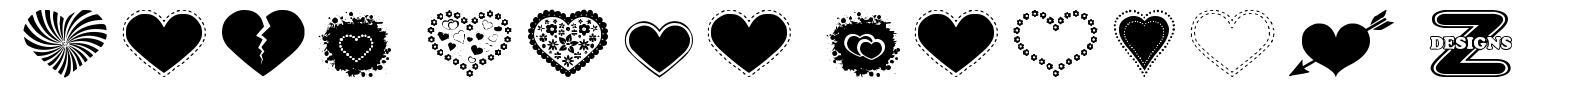 Sexy Love Hearts 2 font